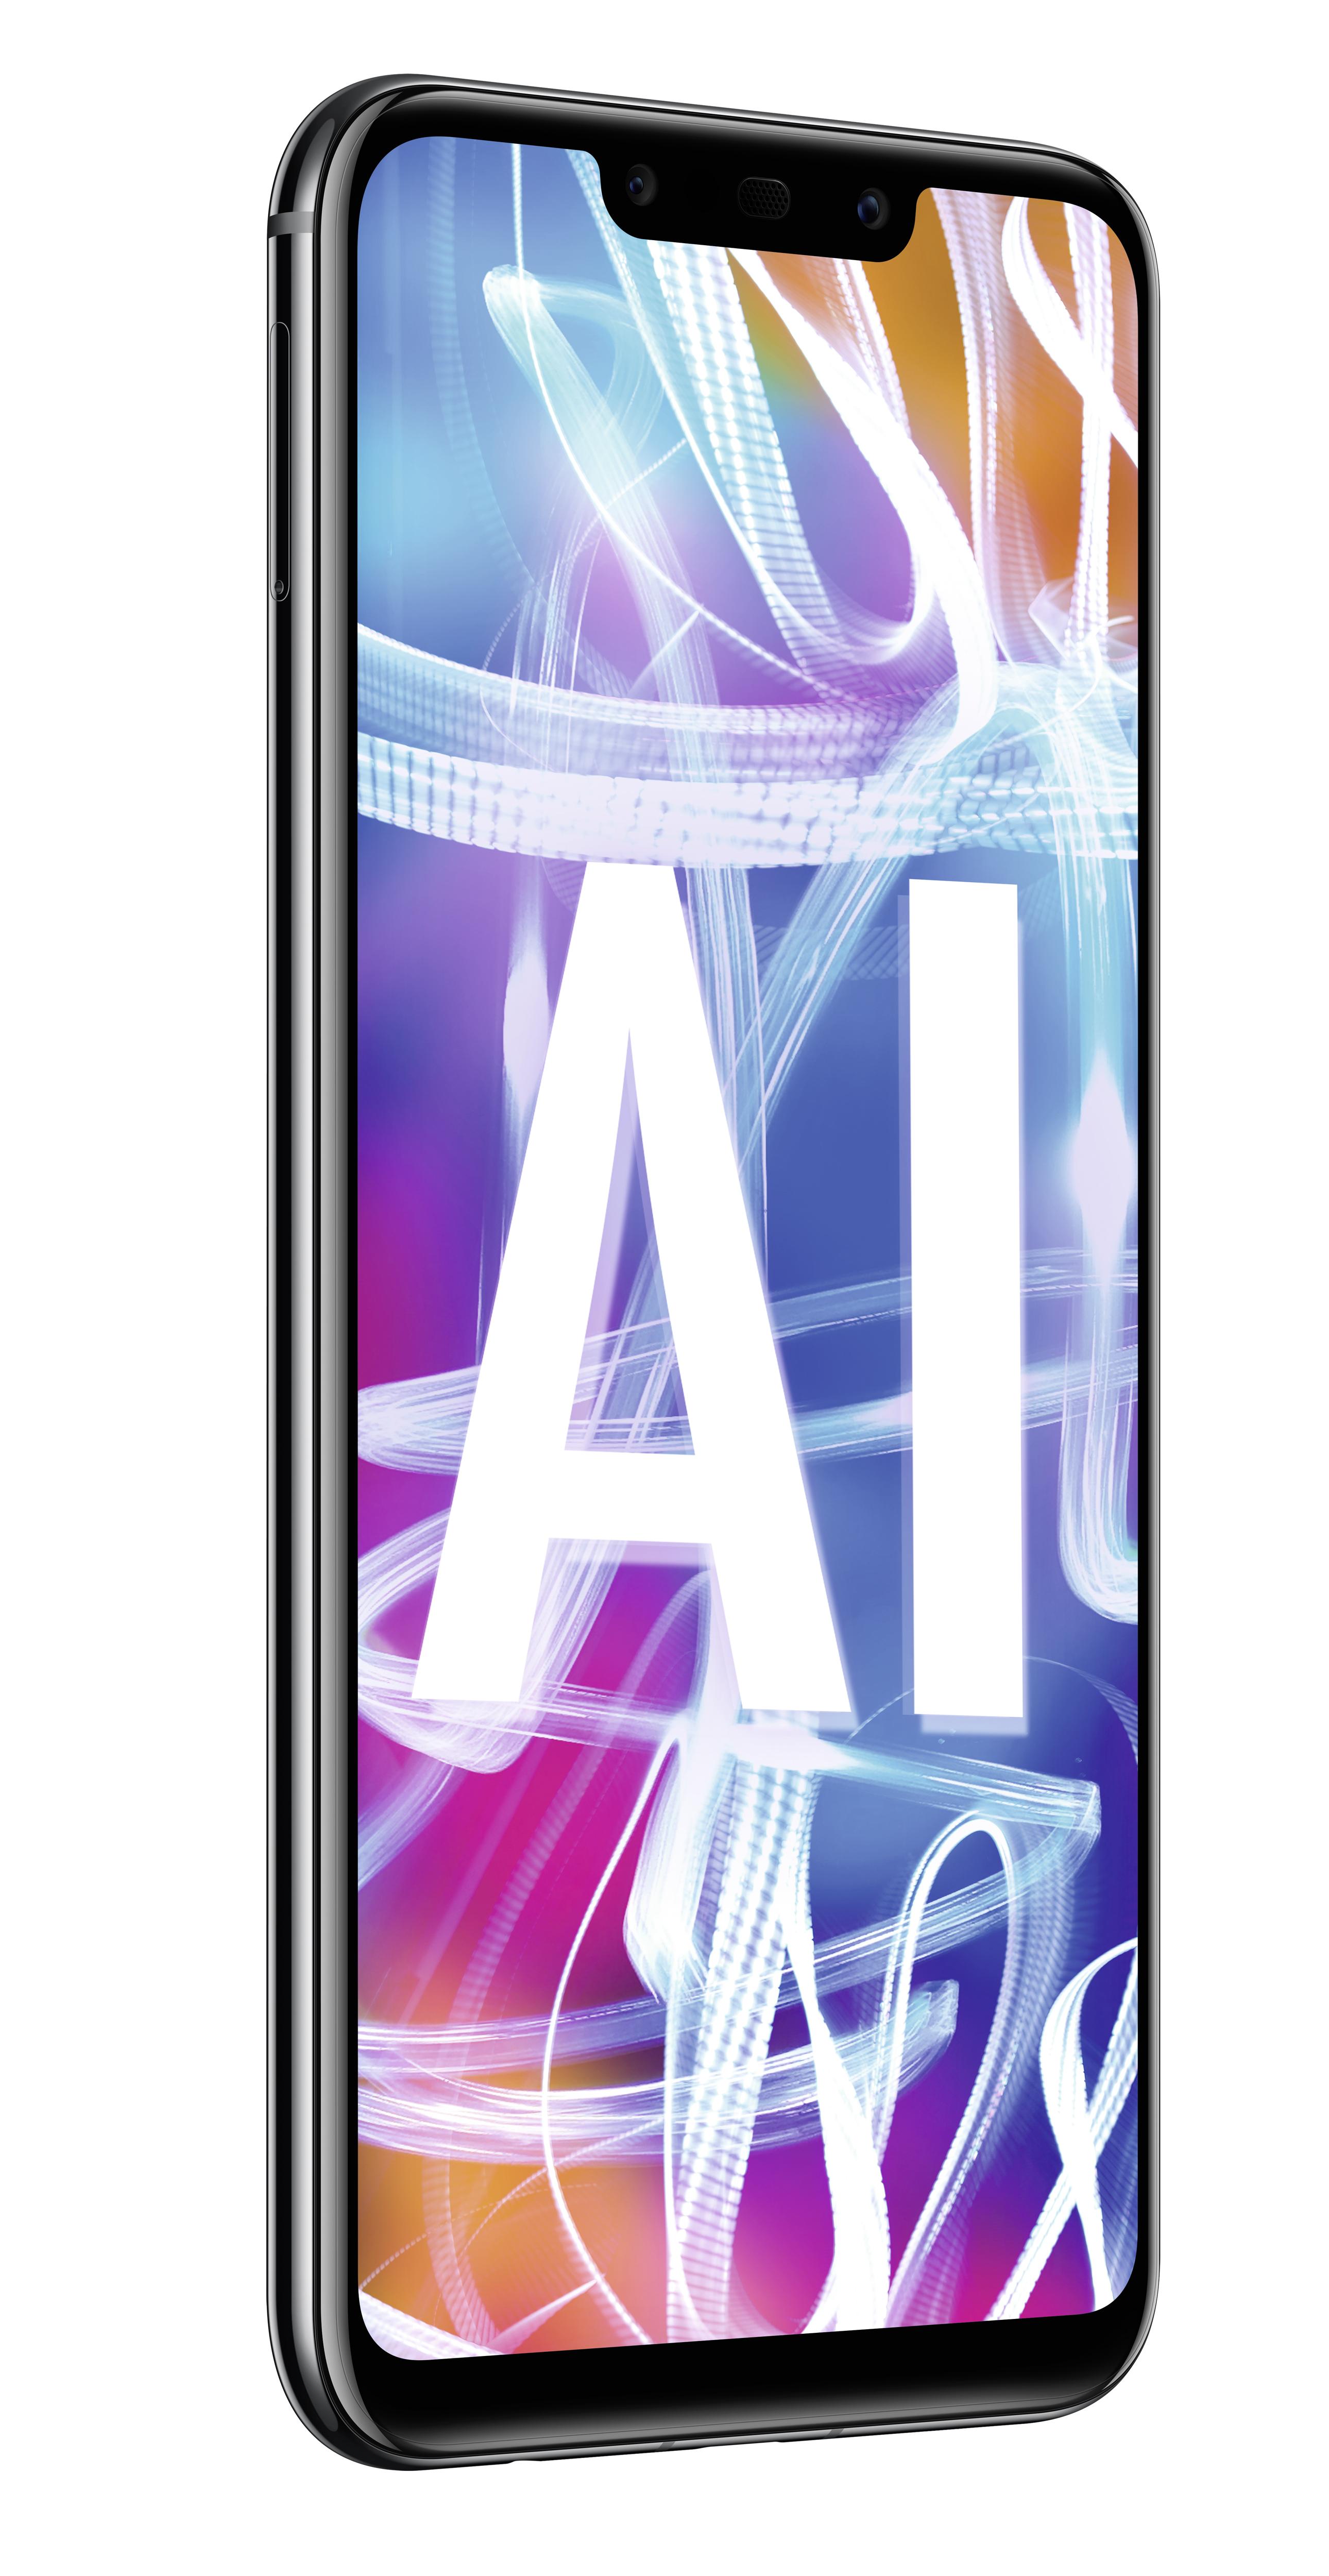 Android-Smartphone: Huawei Mate 20 Lite kostet 400 Euro - Das neue Mate 20 Lite von Huawei (Bild: Huawei)